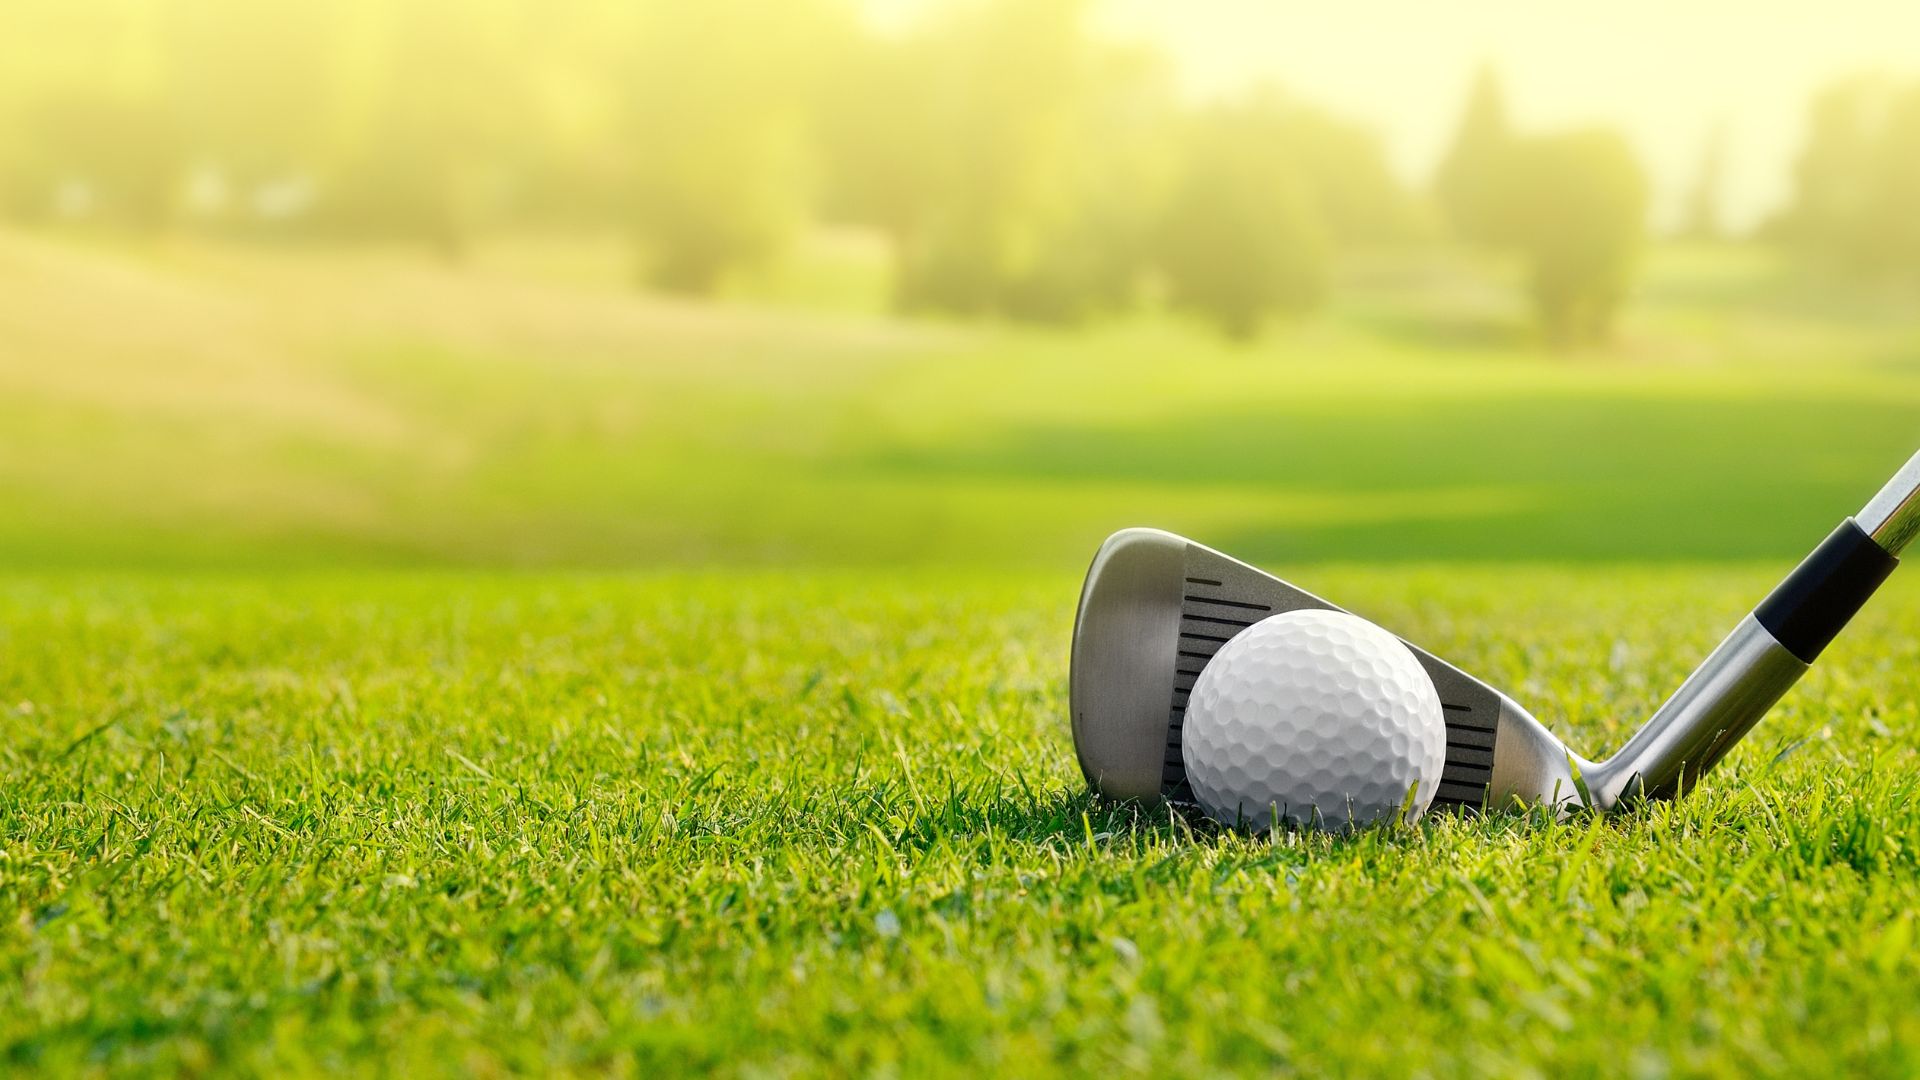 This Week in Golf